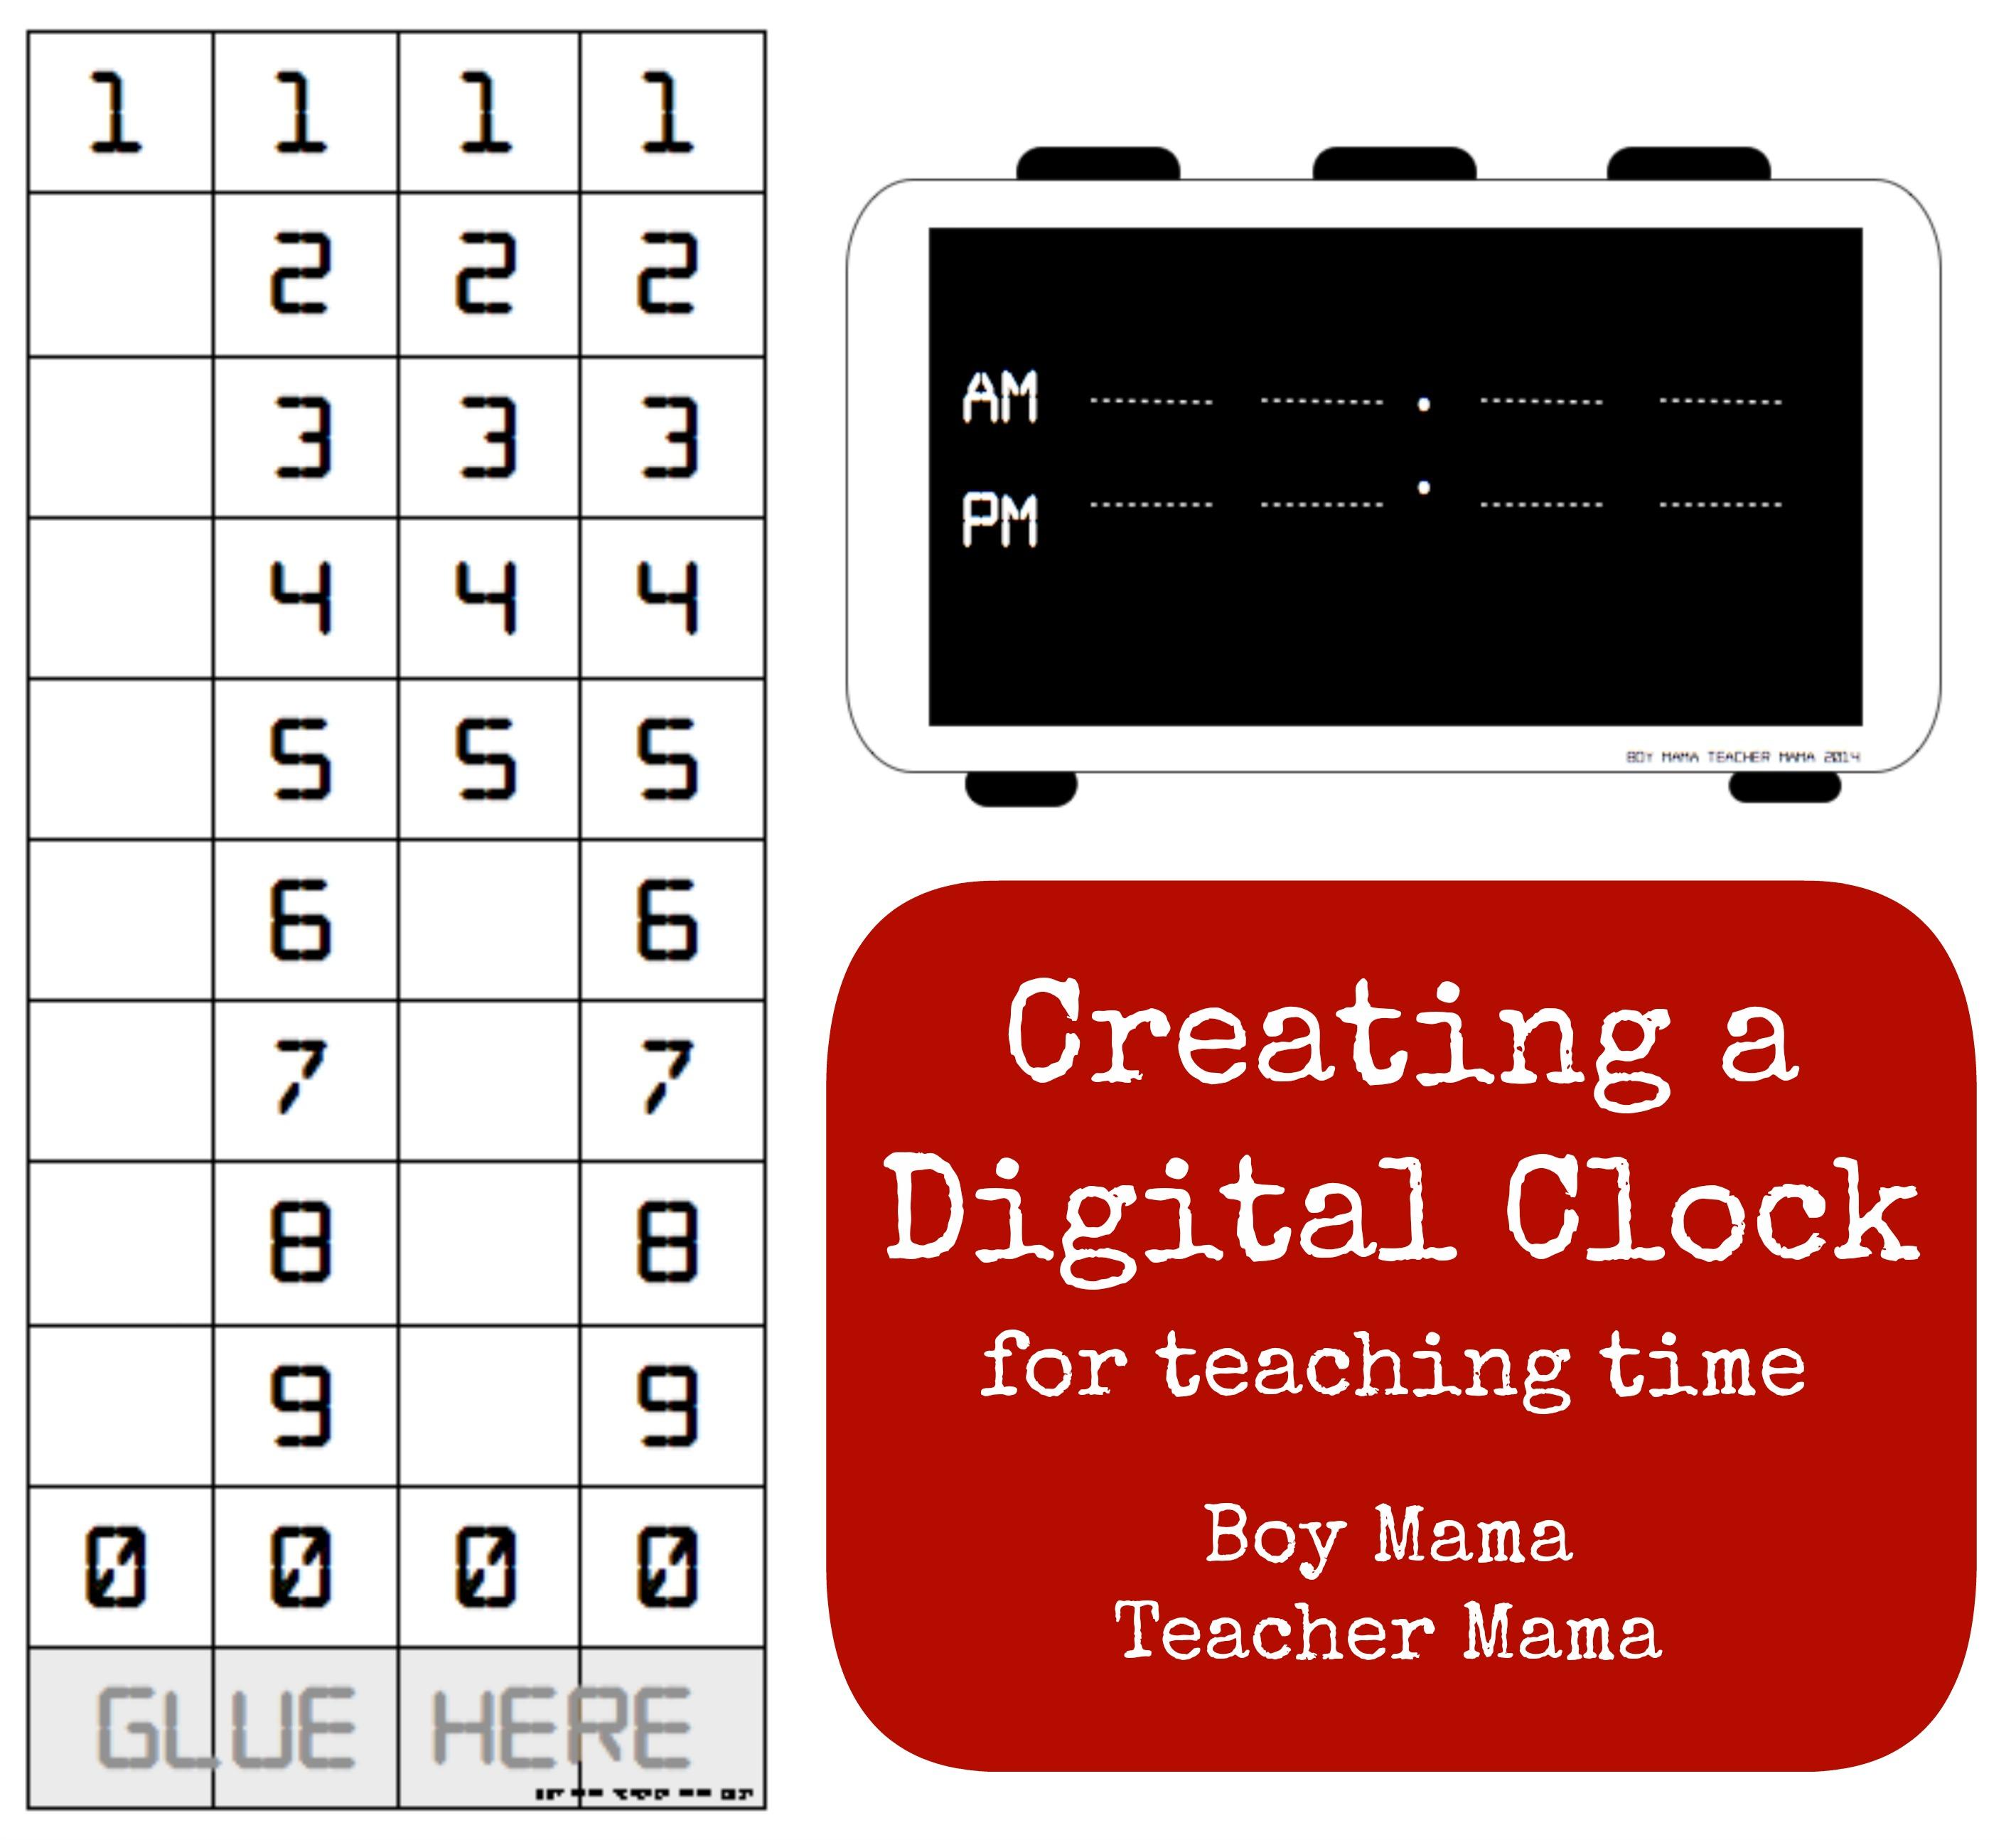 Boy Mama Teacher Mama Creating a Digital Clock.jpg.jpg